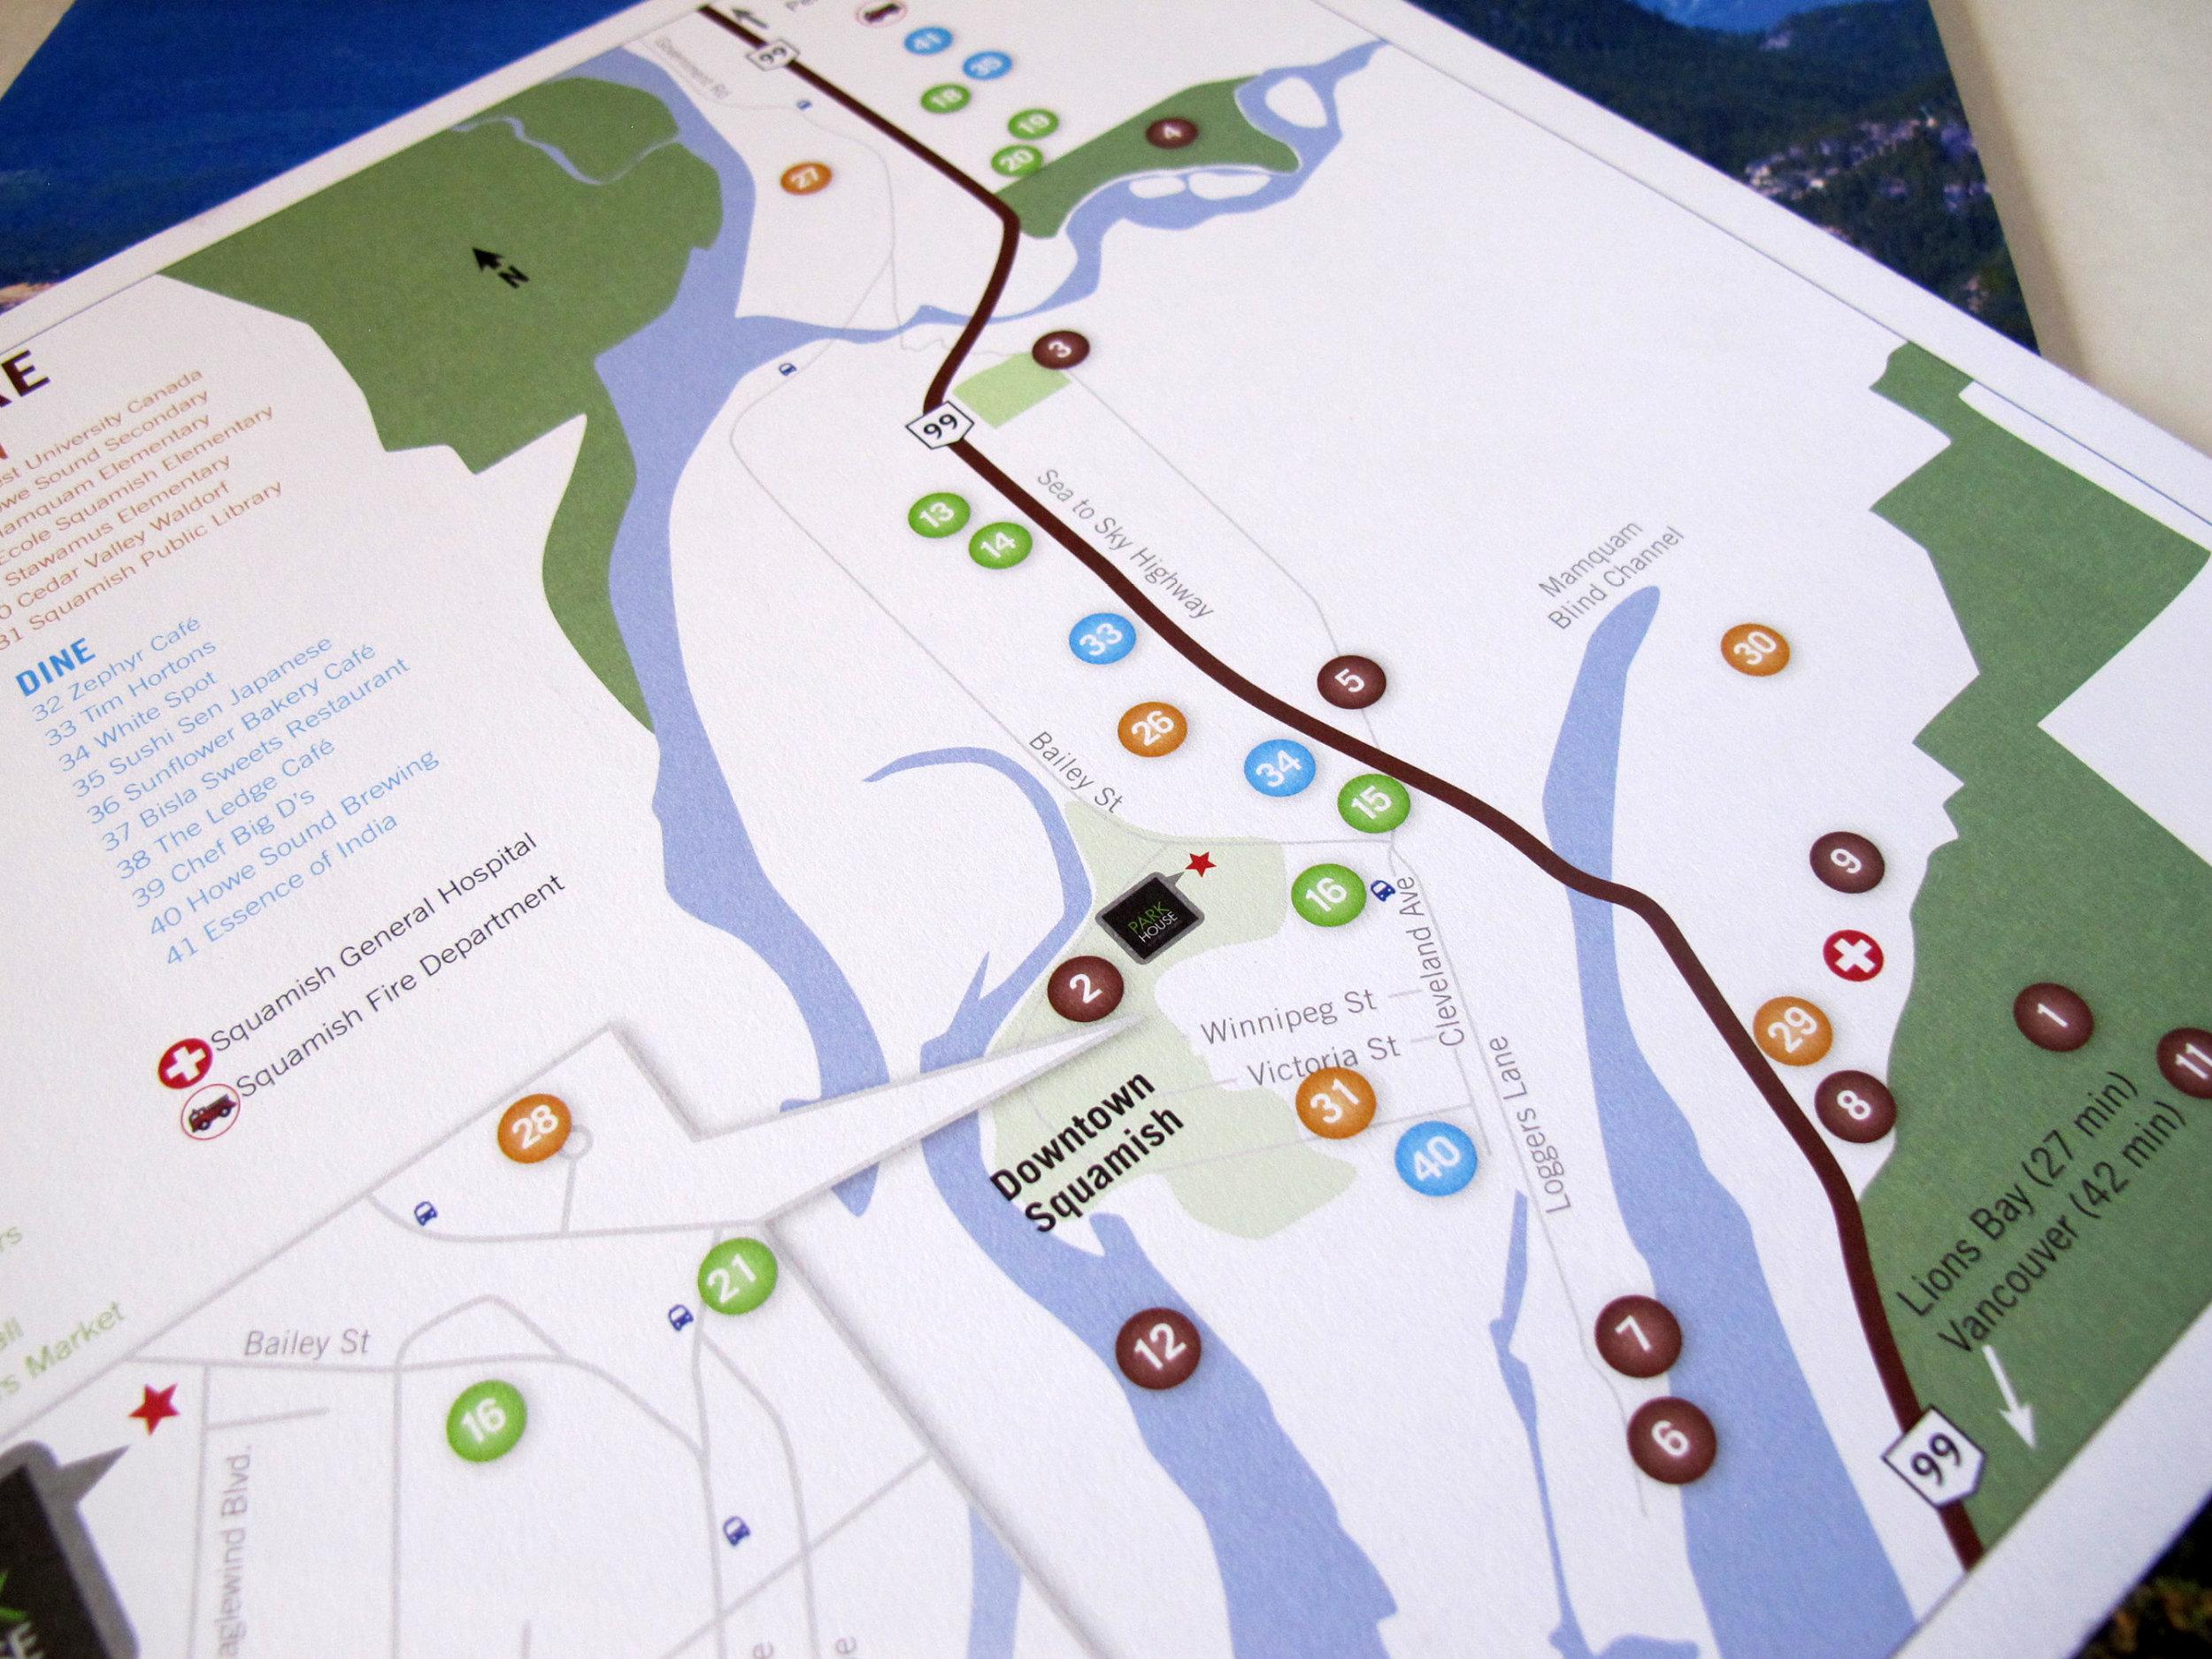 parkhouse map 2.jpg